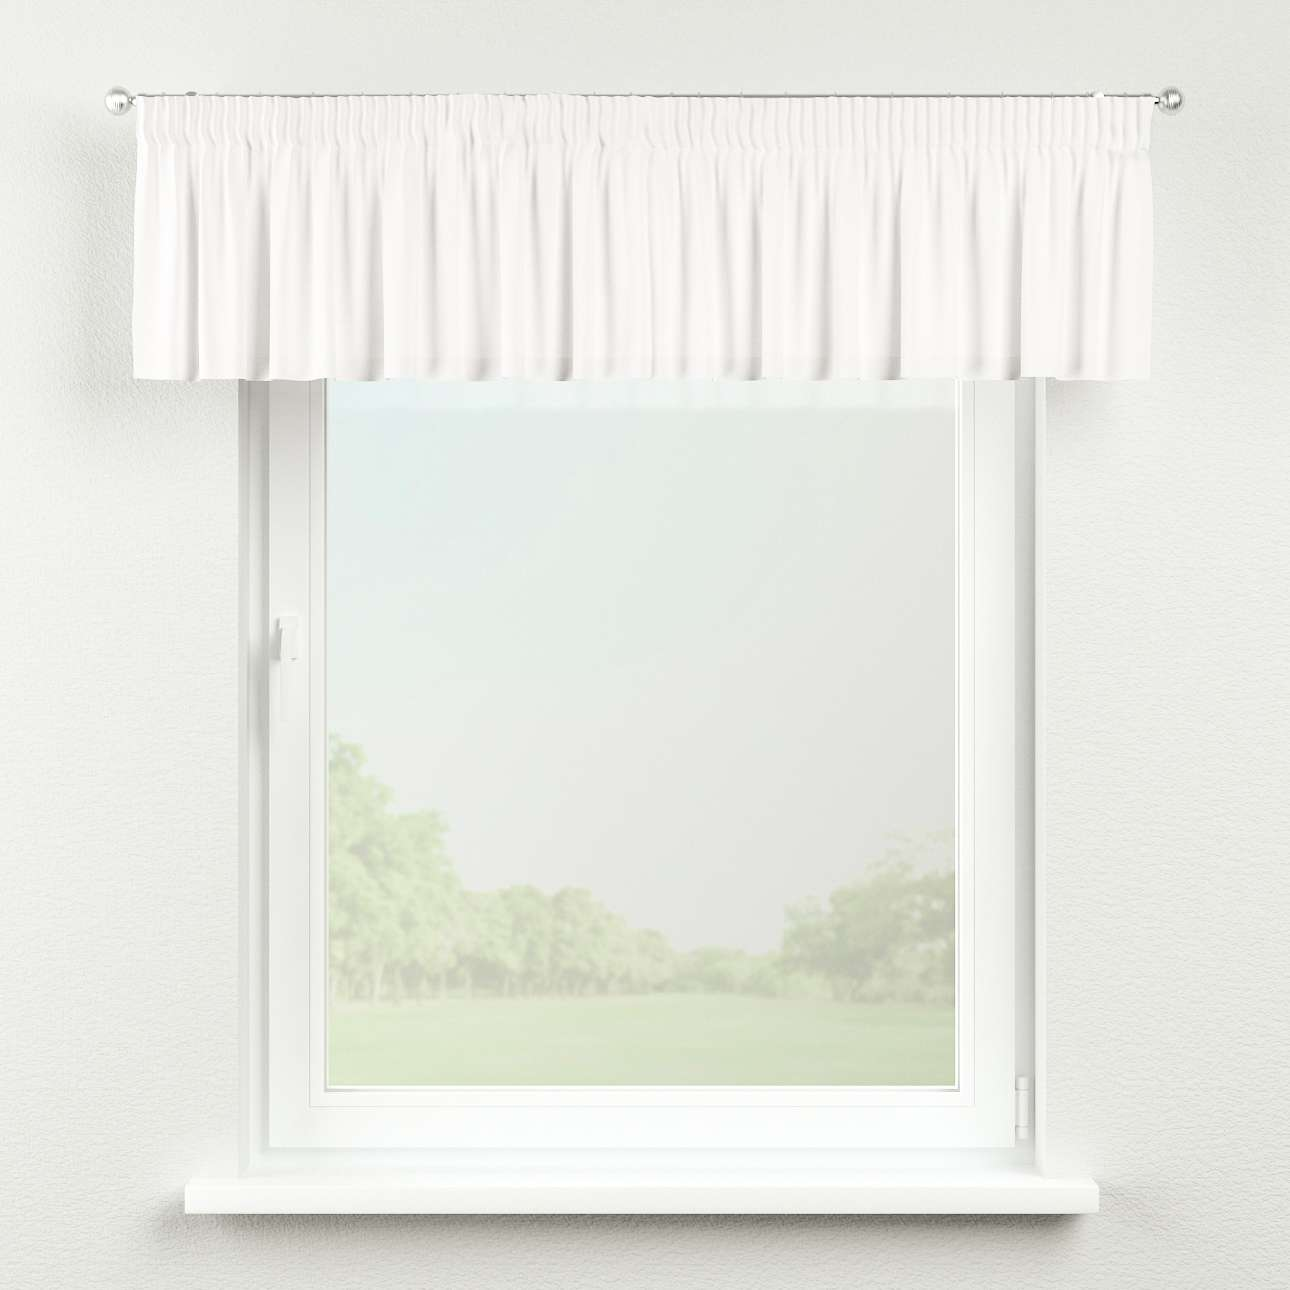 Kurzgardine mit Kräuselband 130 x 40 cm von der Kollektion Cotton Panama, Stoff: 702-34